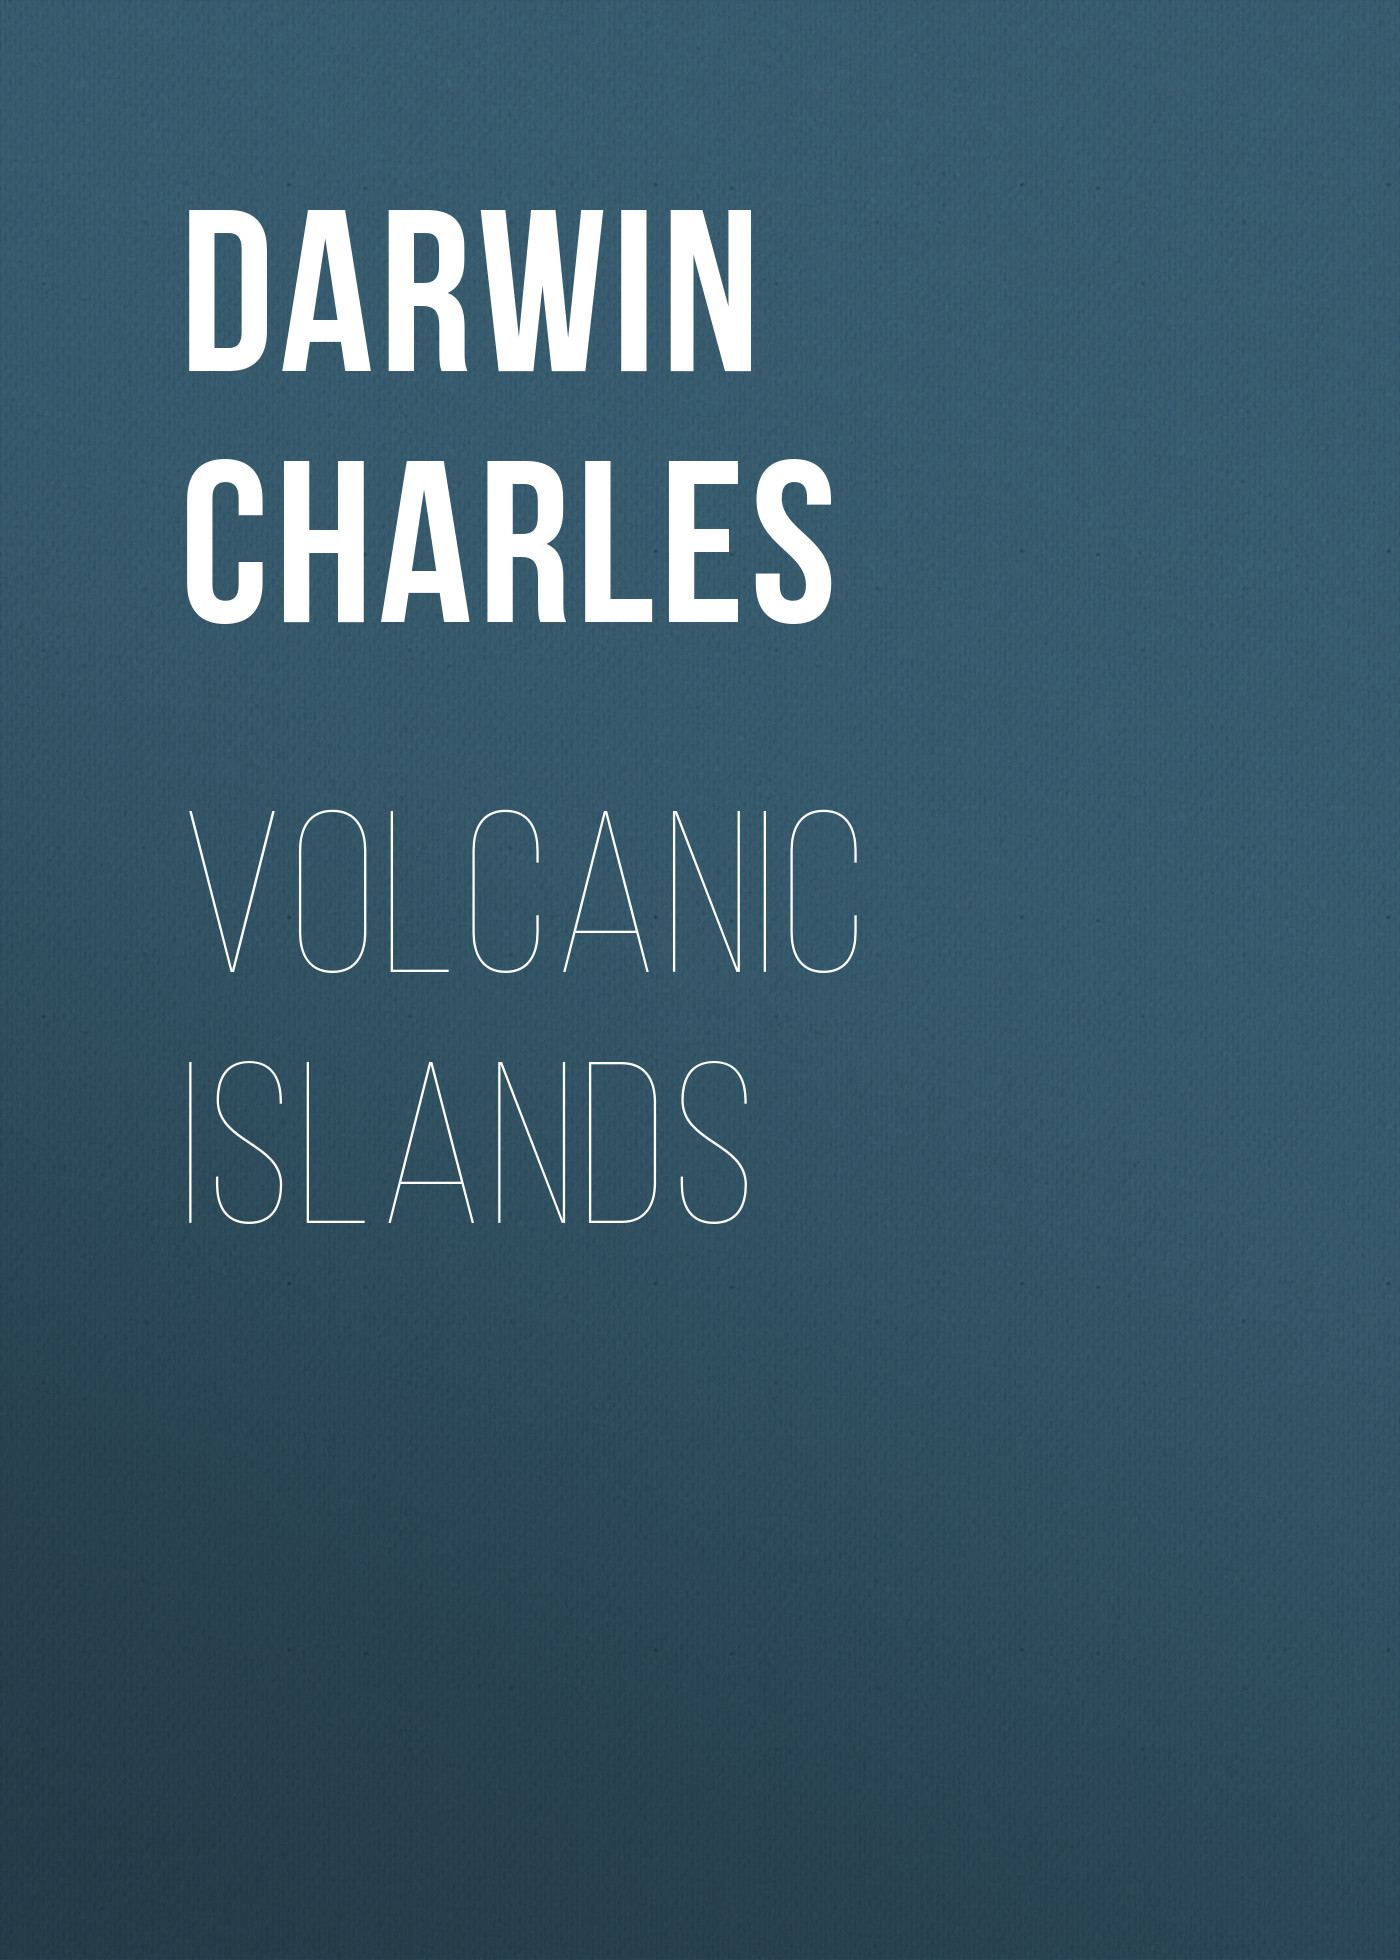 Чарльз Дарвин Volcanic Islands future islands london